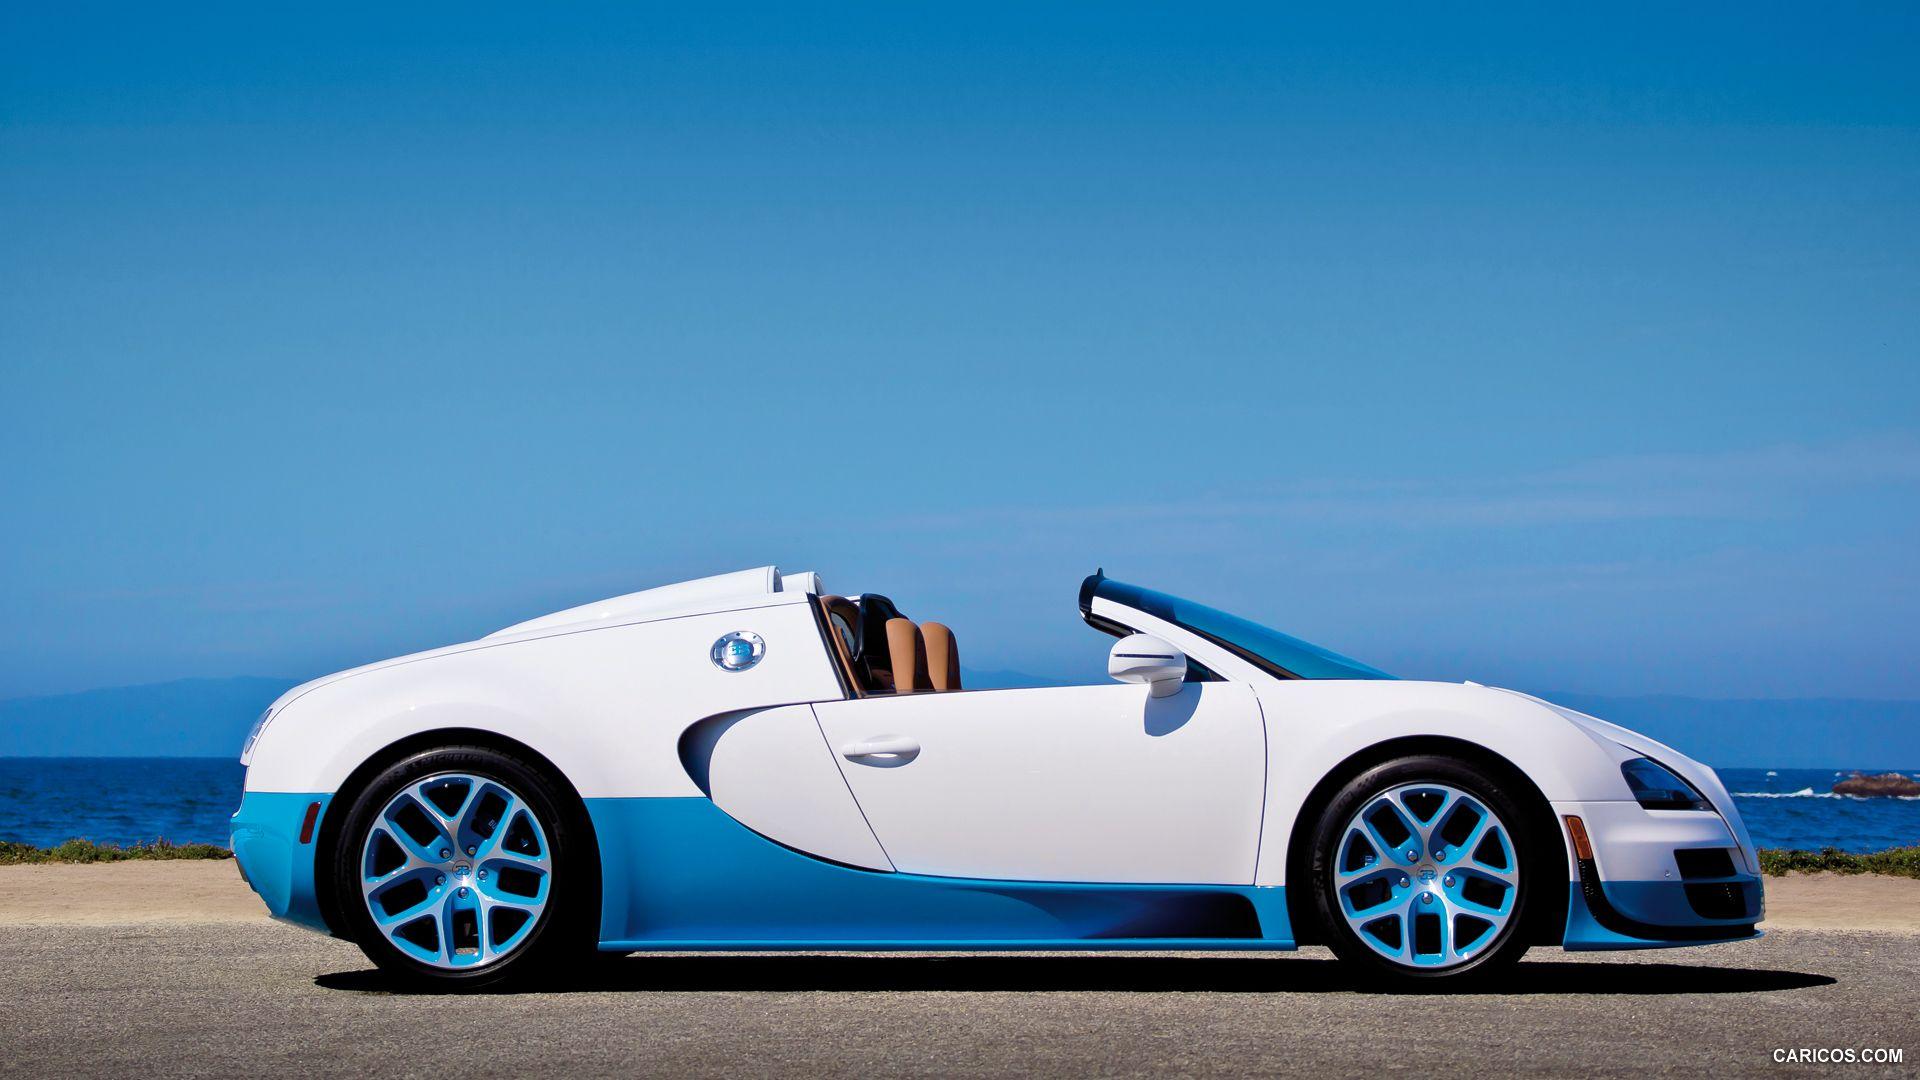 579f13fa17e02fd3de1fafc377505526 Fabulous 2012 Bugatti Veyron Grand Sport Vitesse Specs Cars Trend